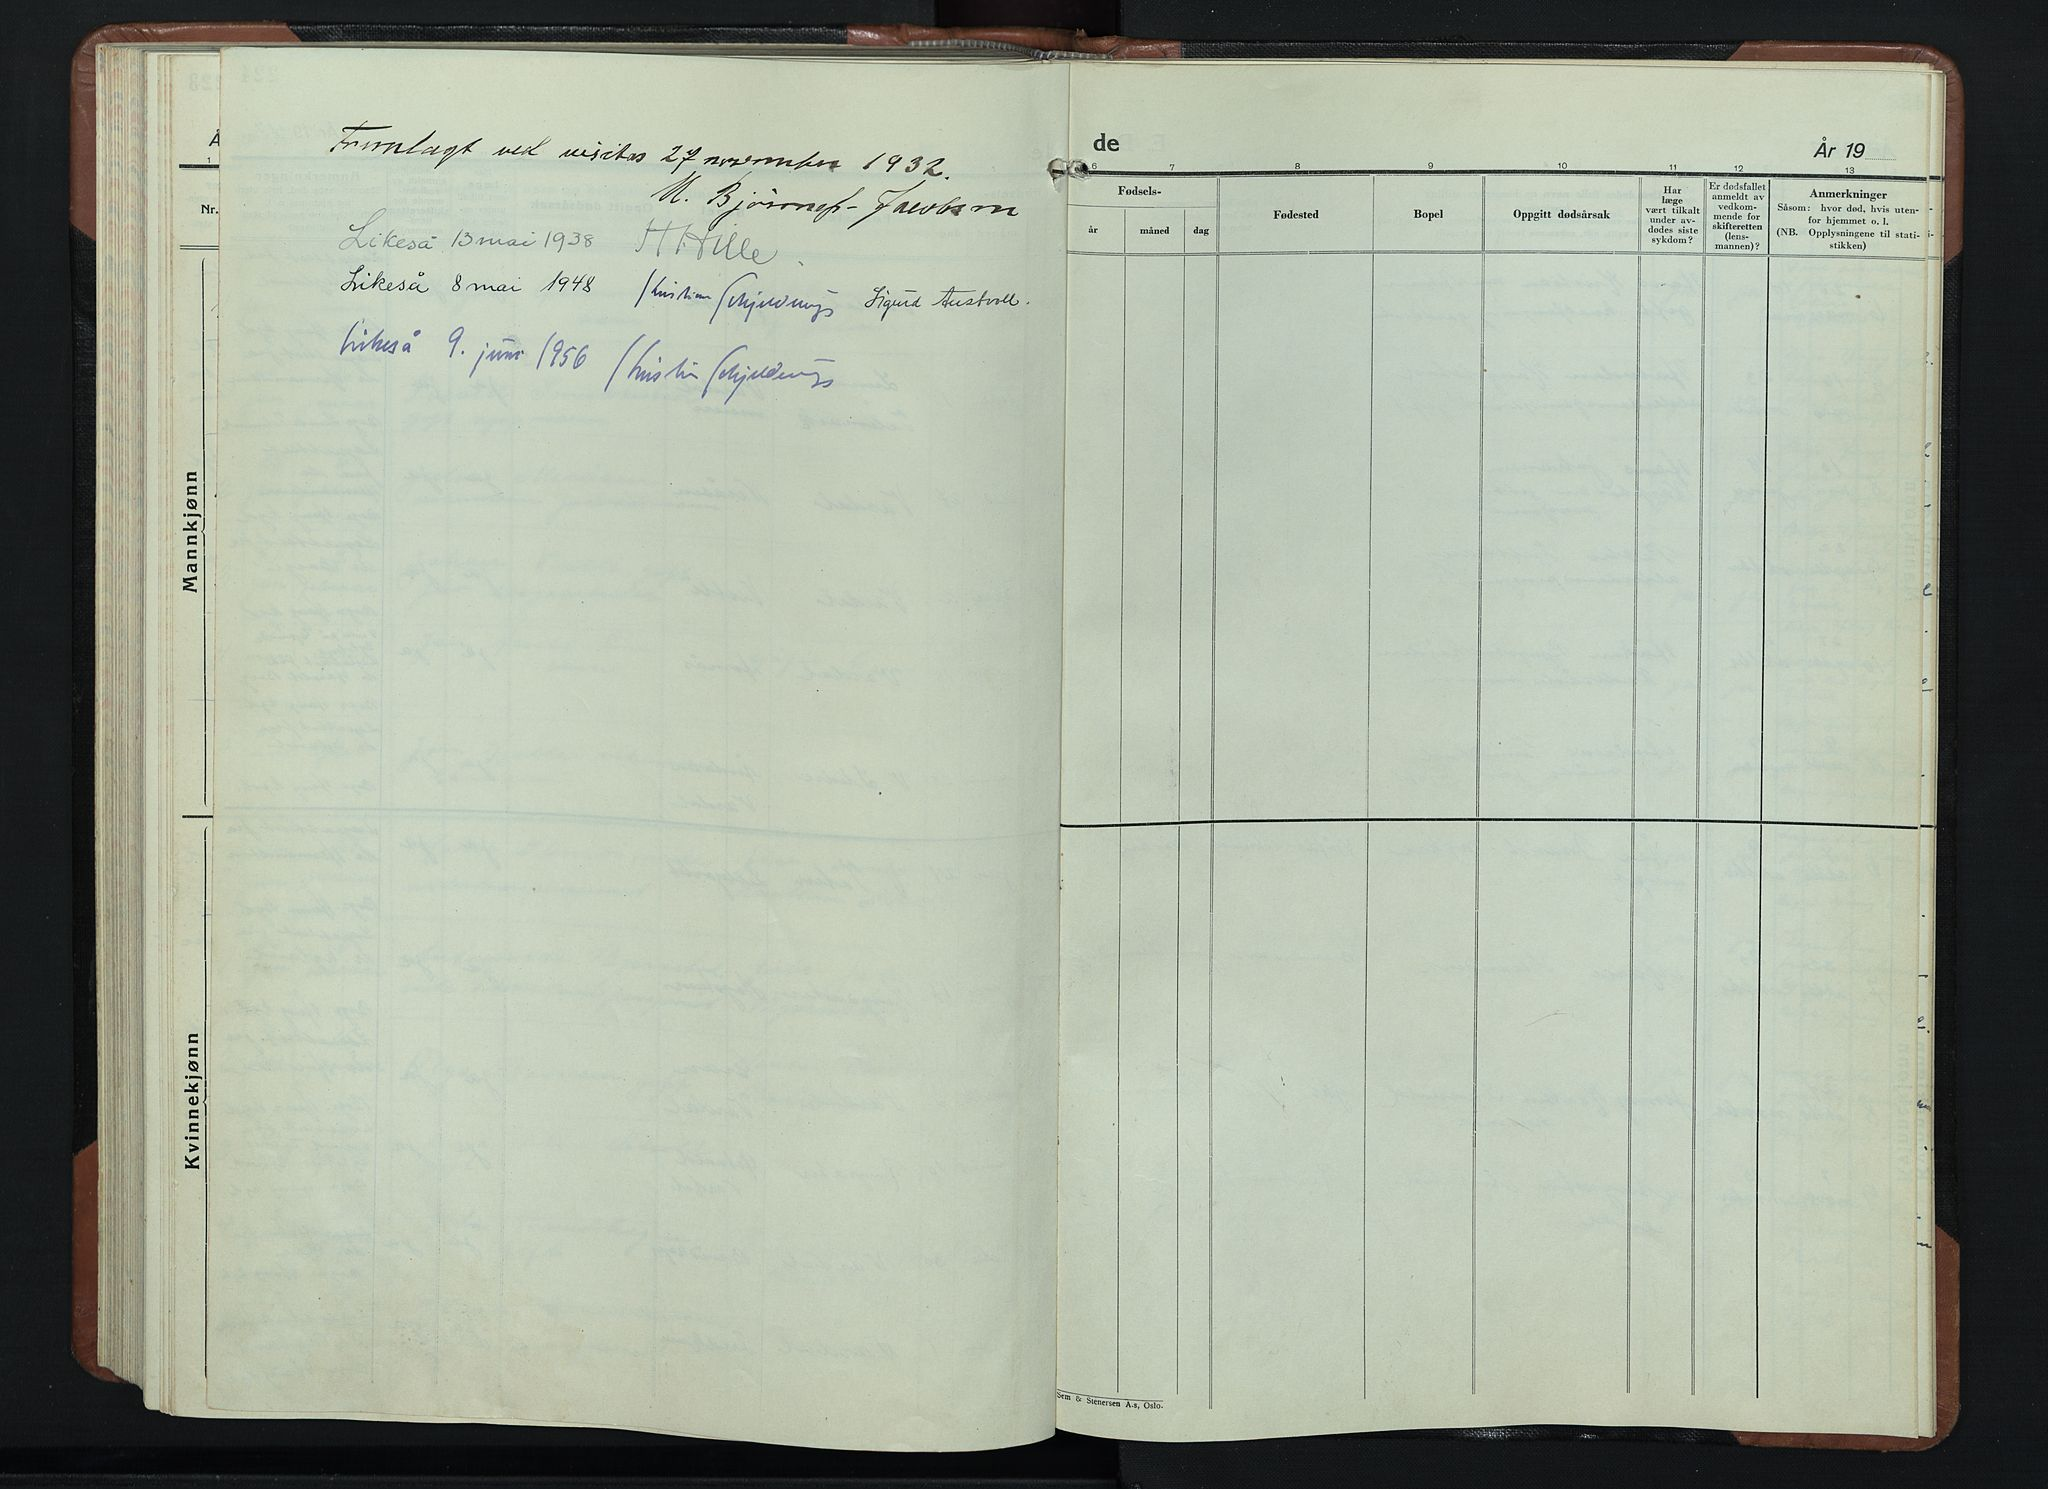 SAH, Vardal prestekontor, H/Ha/Hab/L0018: Klokkerbok nr. 18, 1931-1951